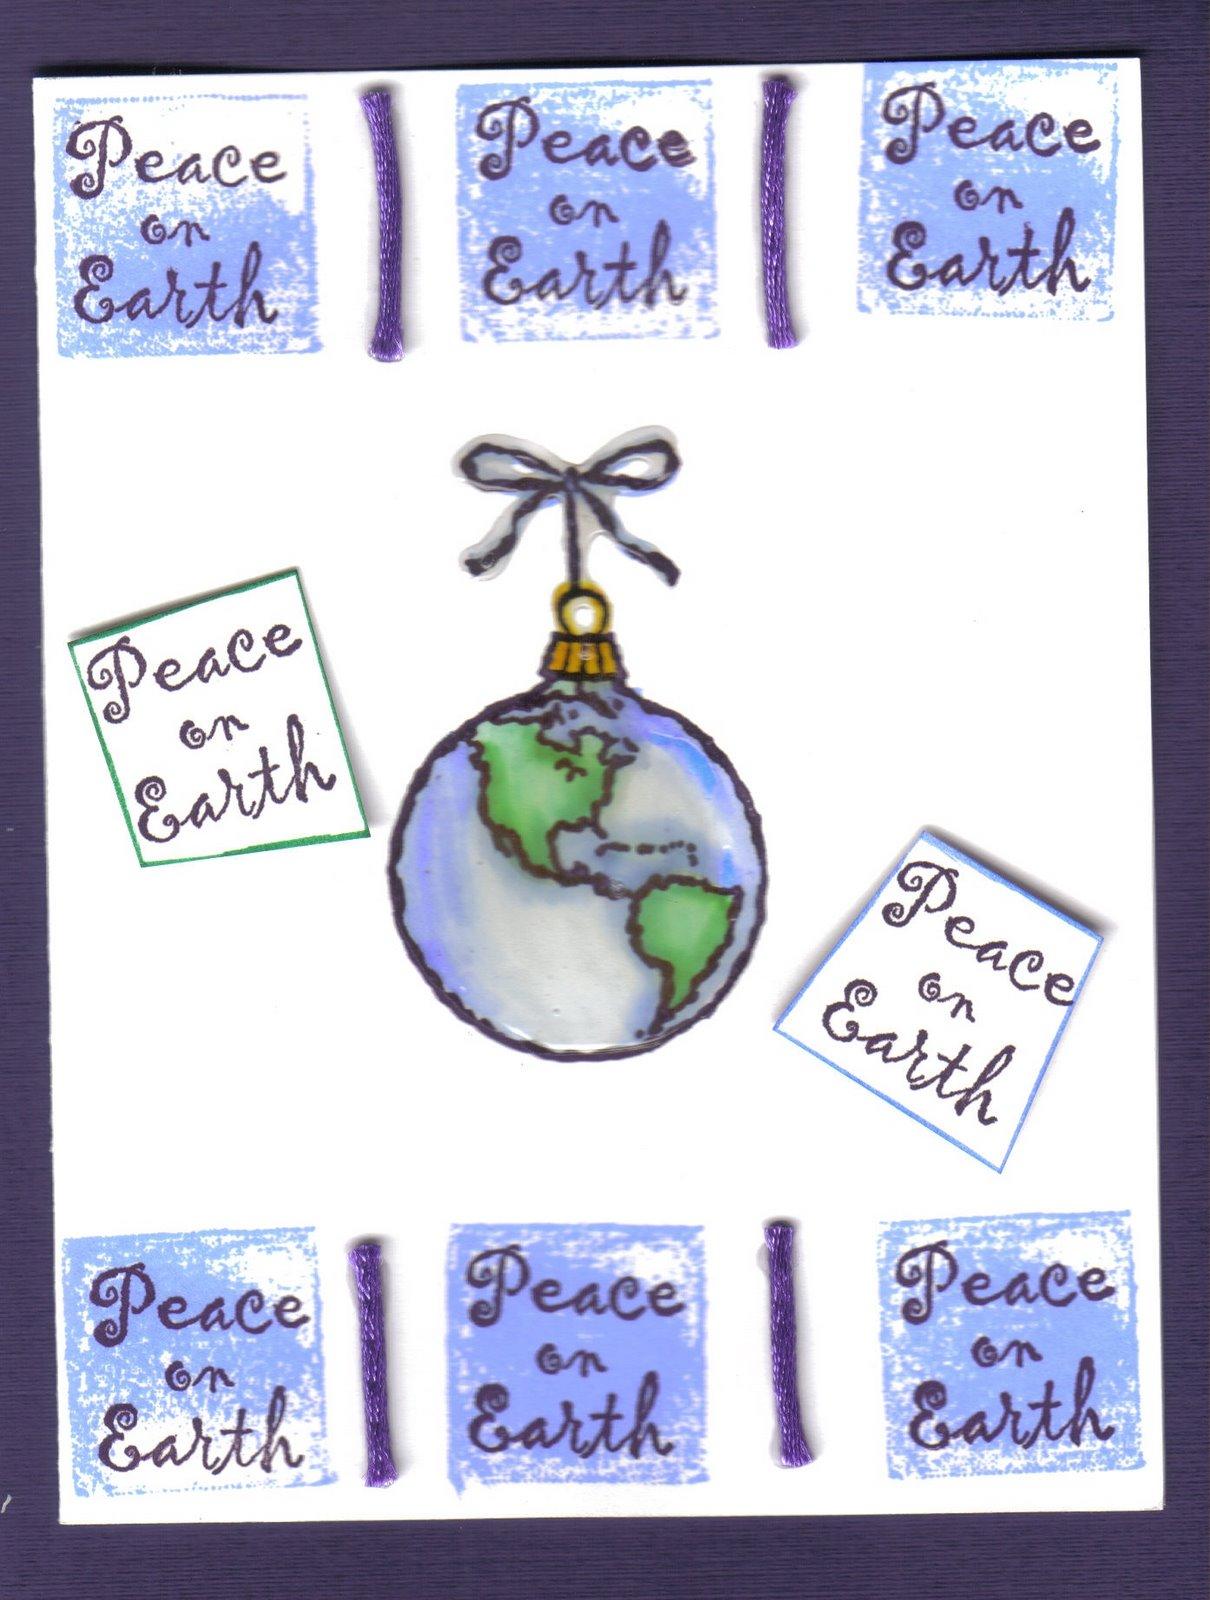 [peace+on+earth.jpg]